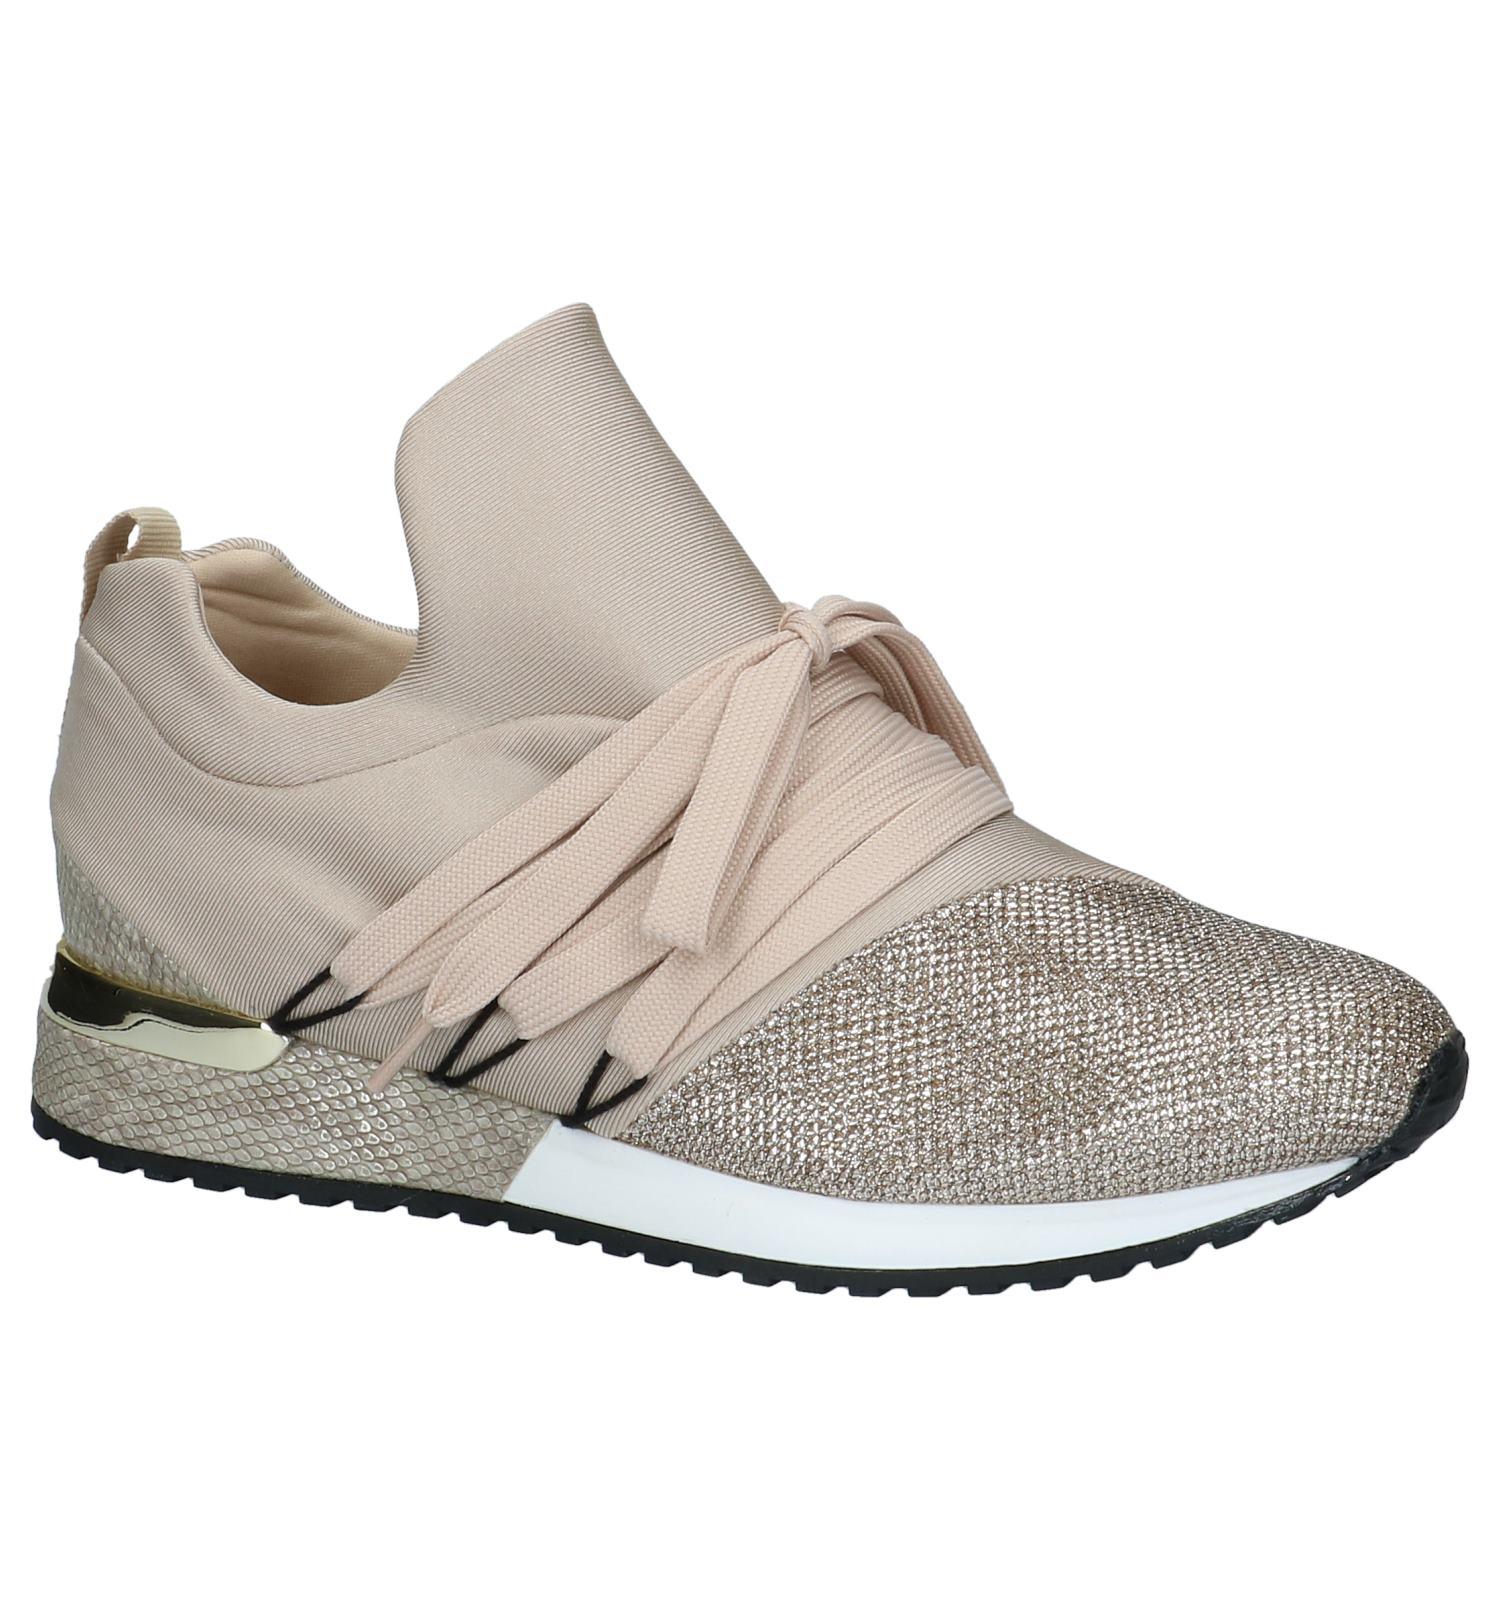 8cc6da78483 Beige La Strada Sneakers | TORFS.BE | Gratis verzend en retour